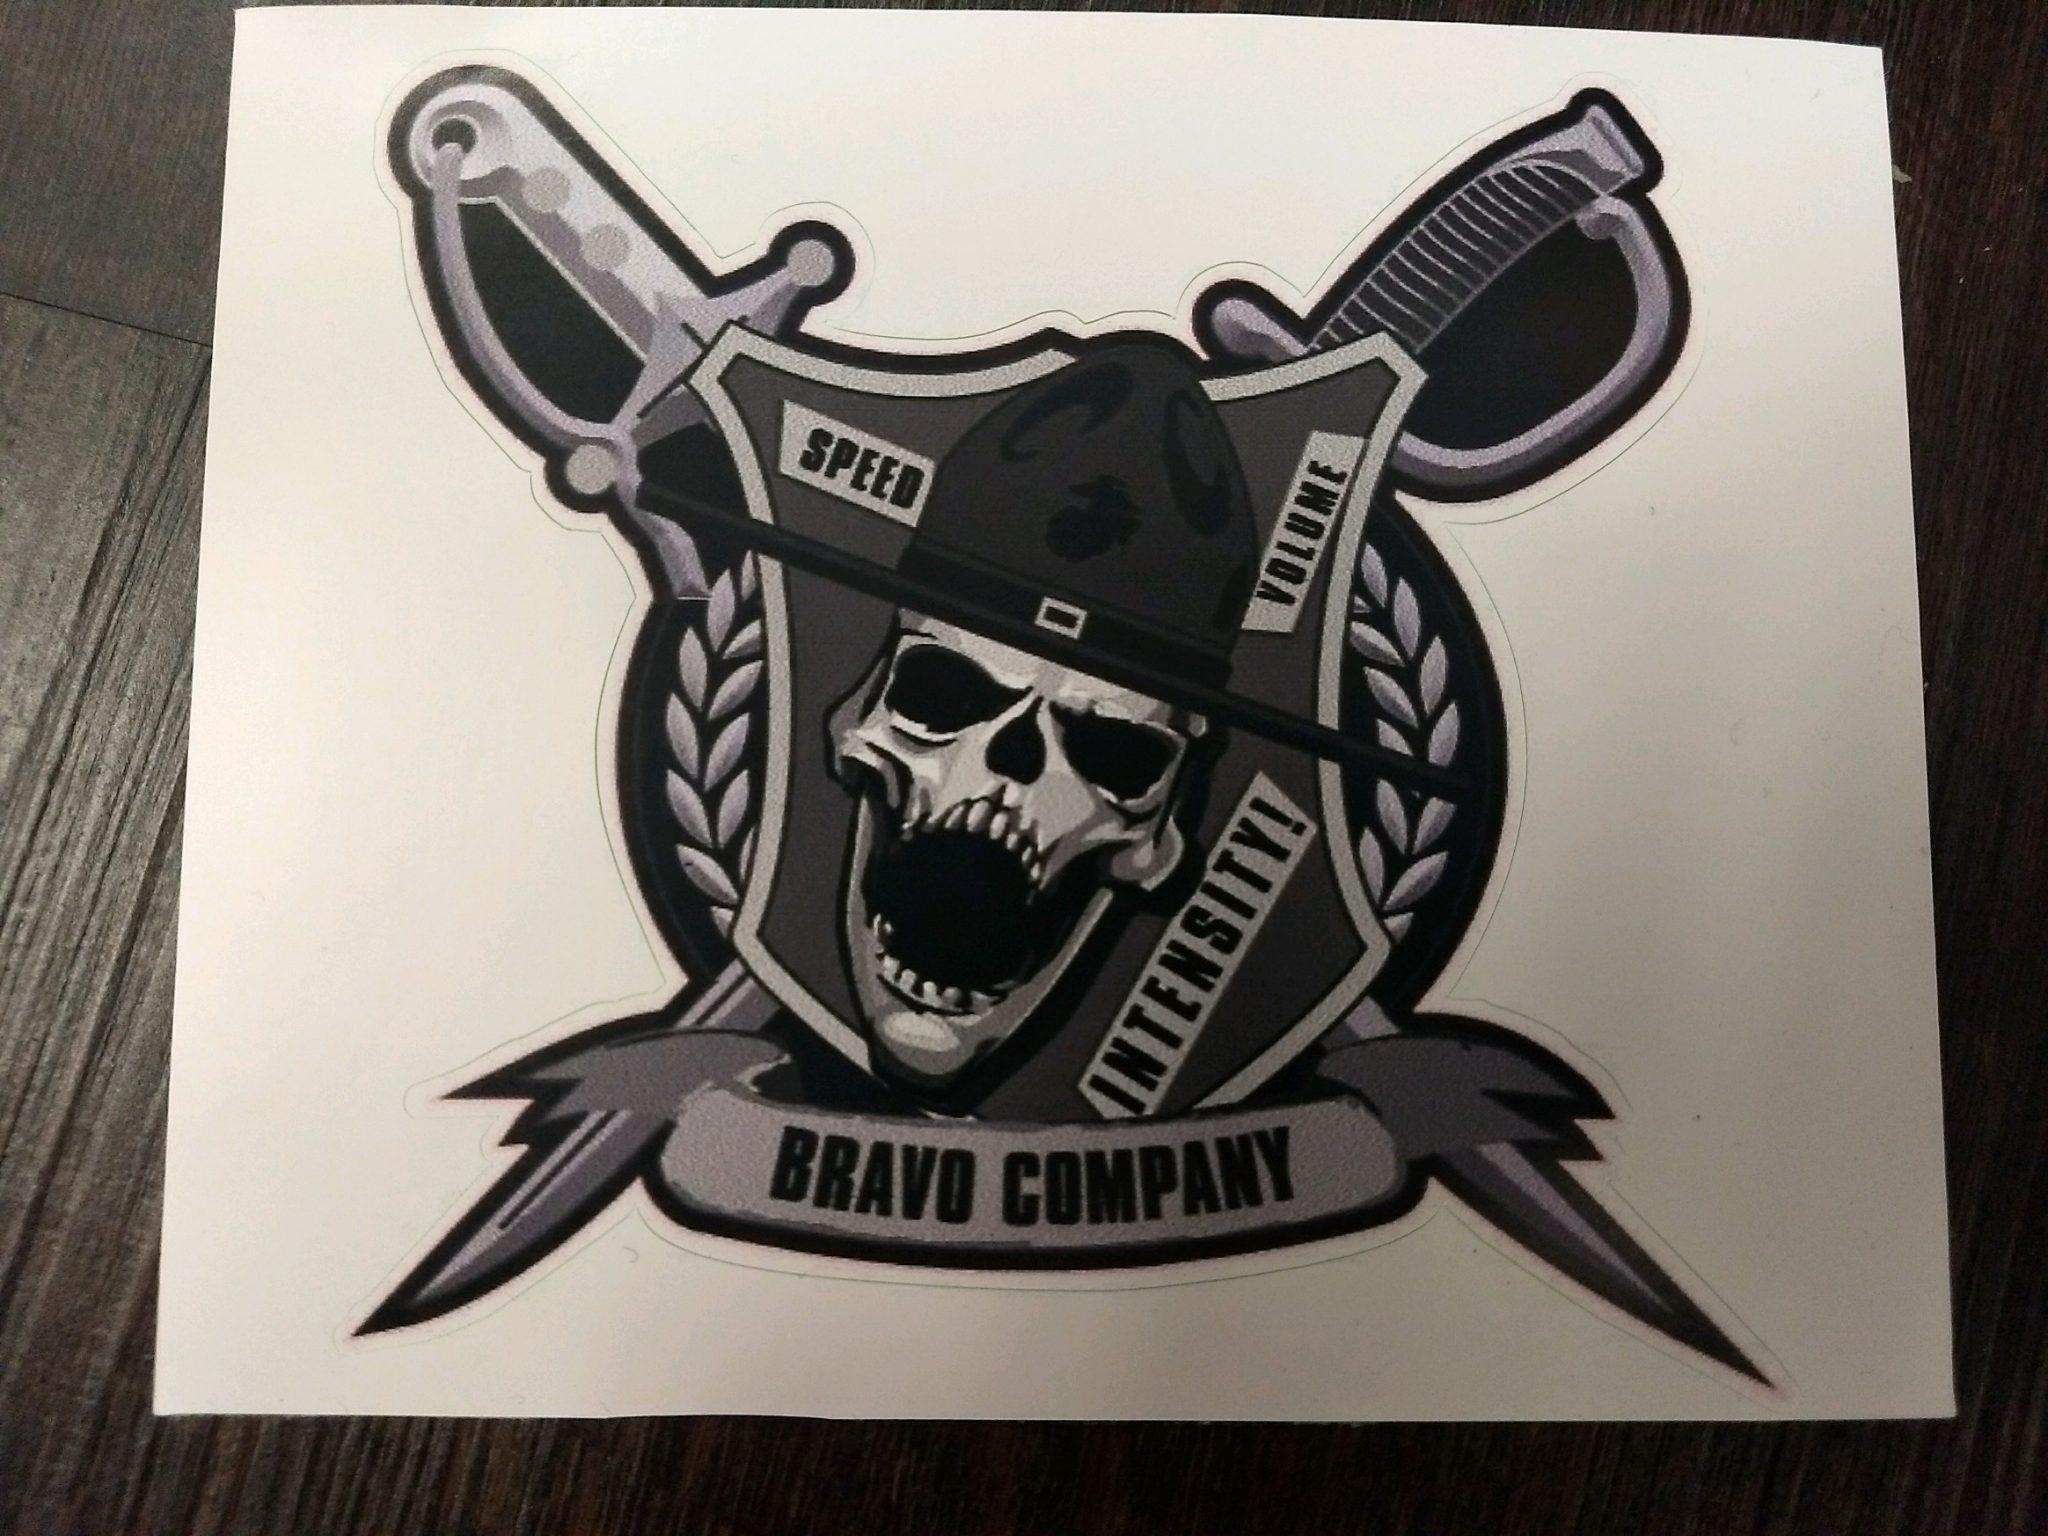 Bravo Company Decal Devil Dog Headquarter